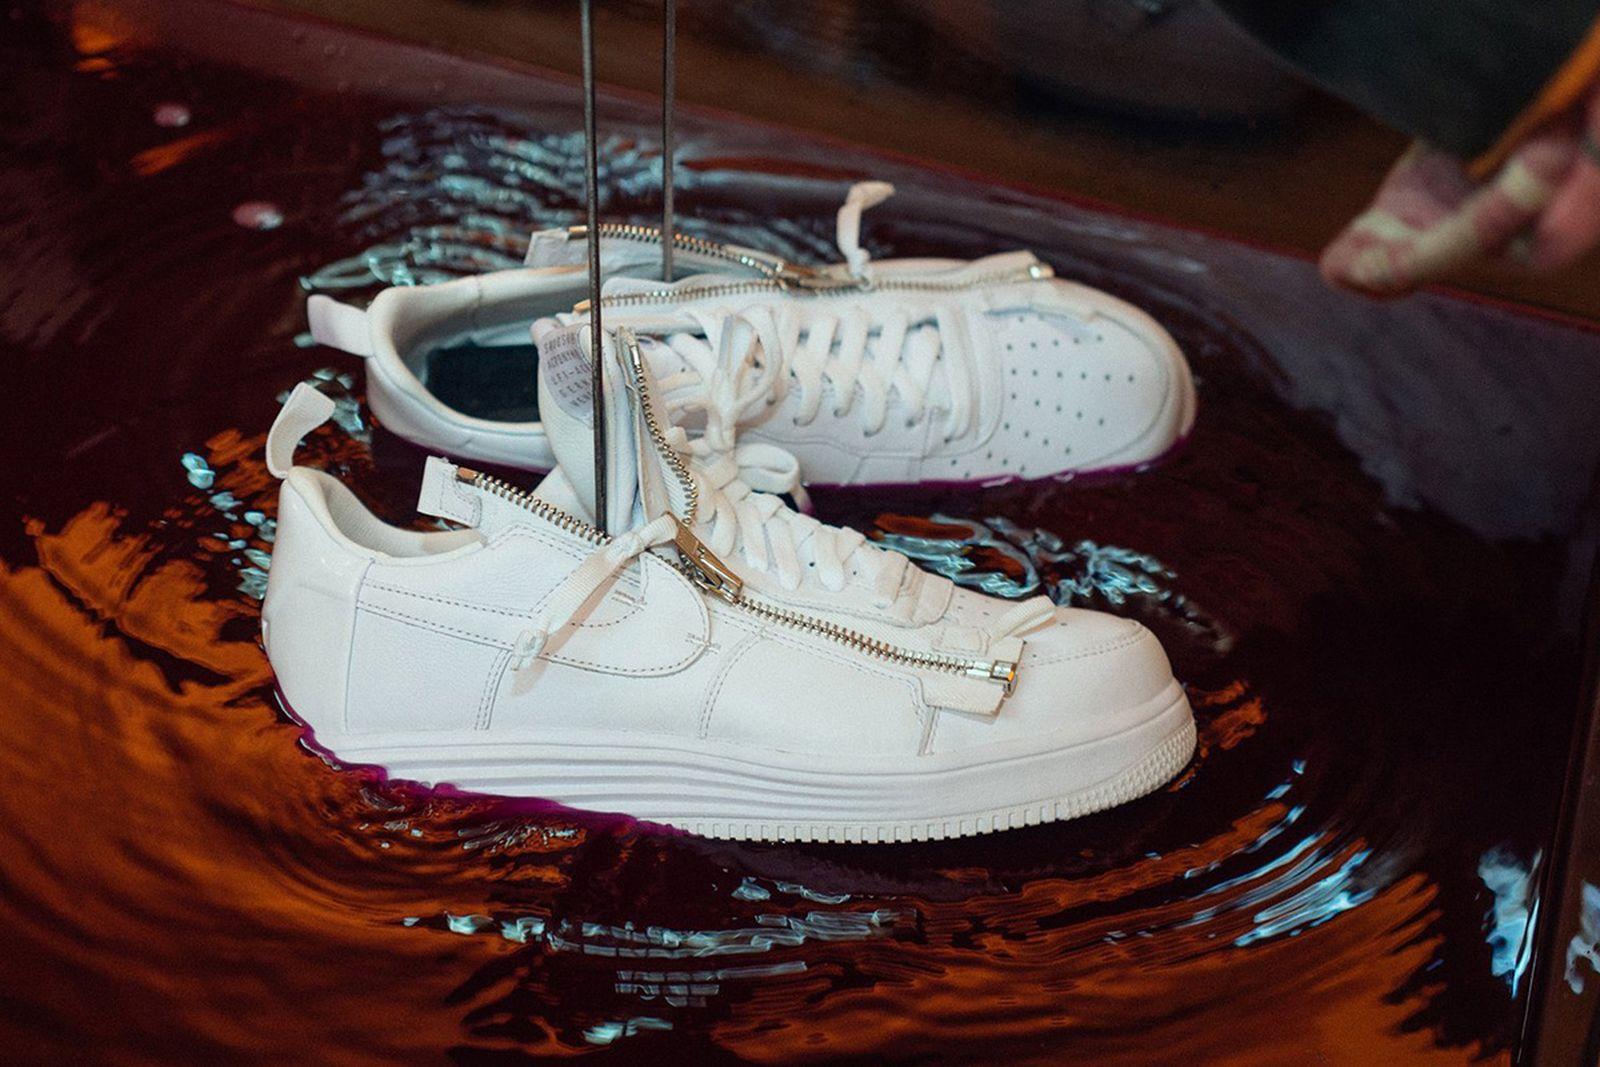 dye sneakers feature main Nike The Ten OFF-WHITE c/o Virgil Abloh Travis Scott Nike Air Force 1 Low